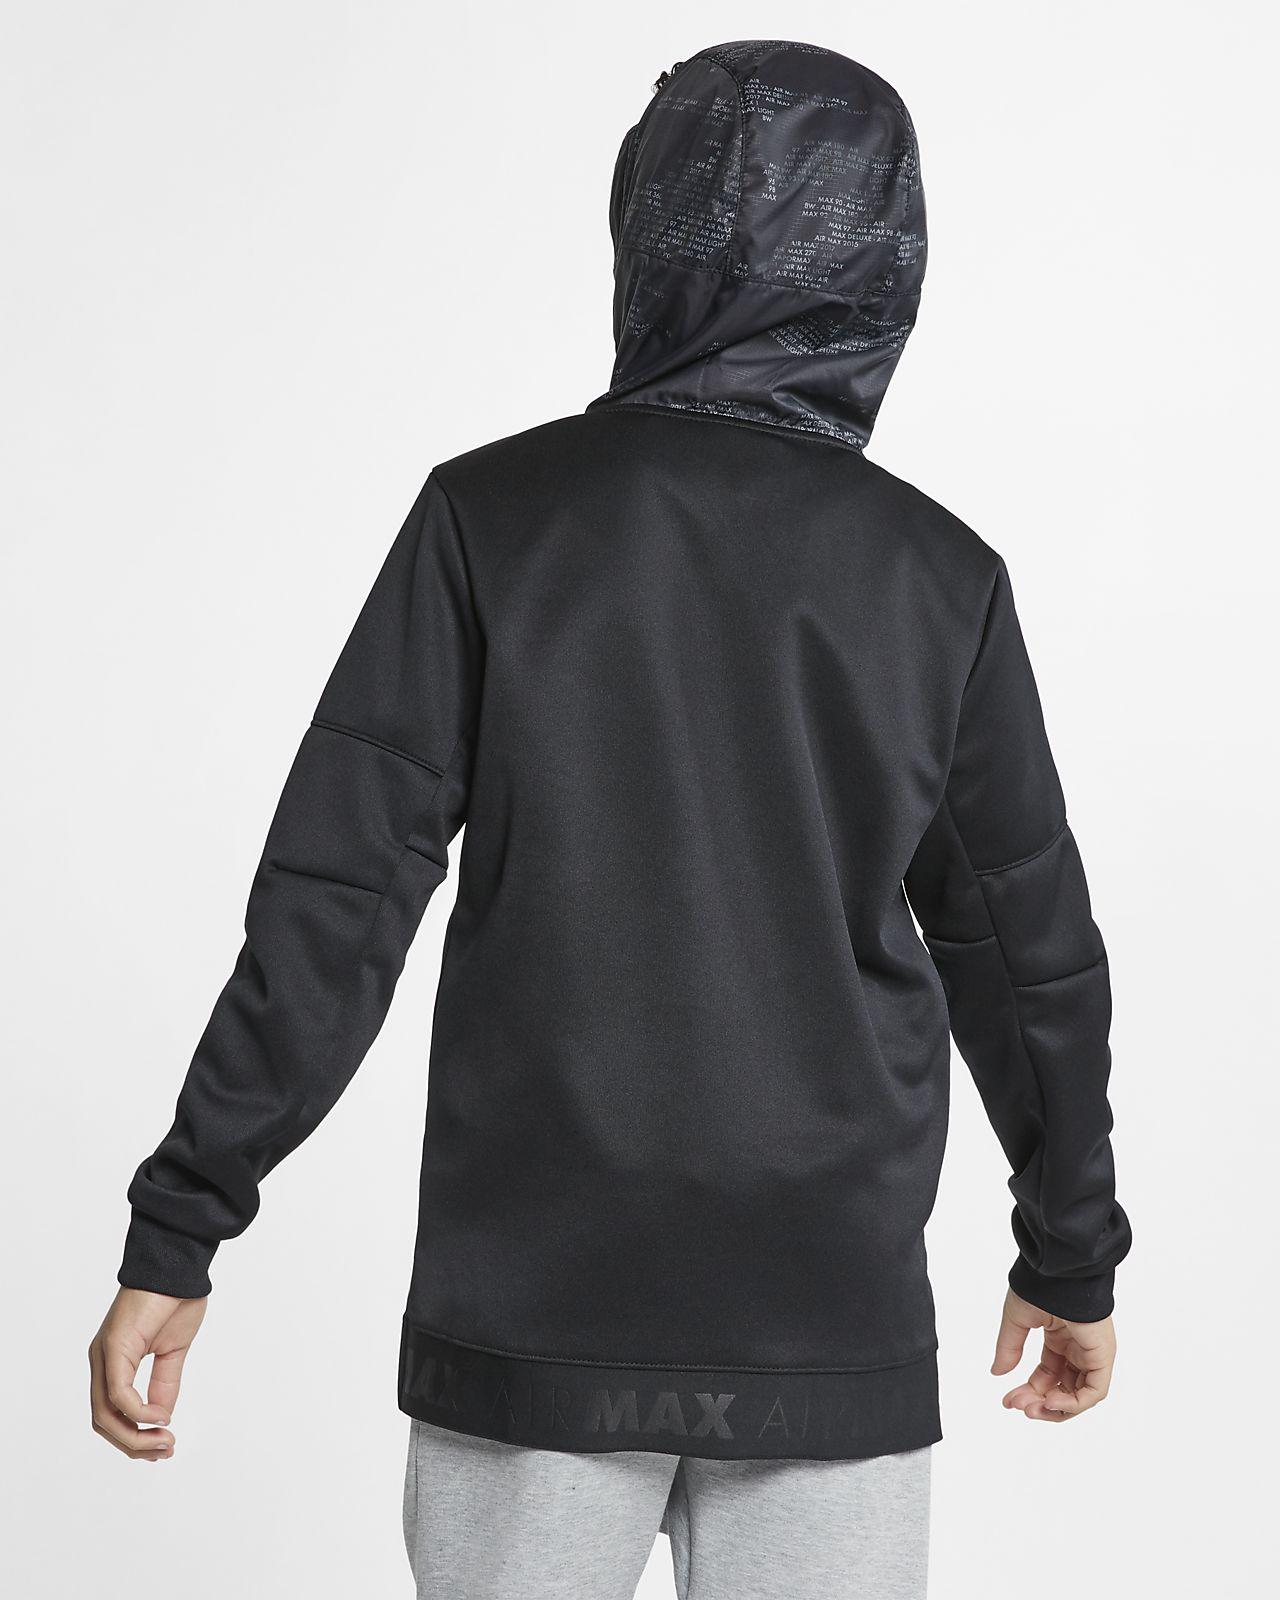 1c1aebdbf015 Nike Sportswear Older Kids  (Boys ) 1 2-Zip Hoodie. Nike.com HU